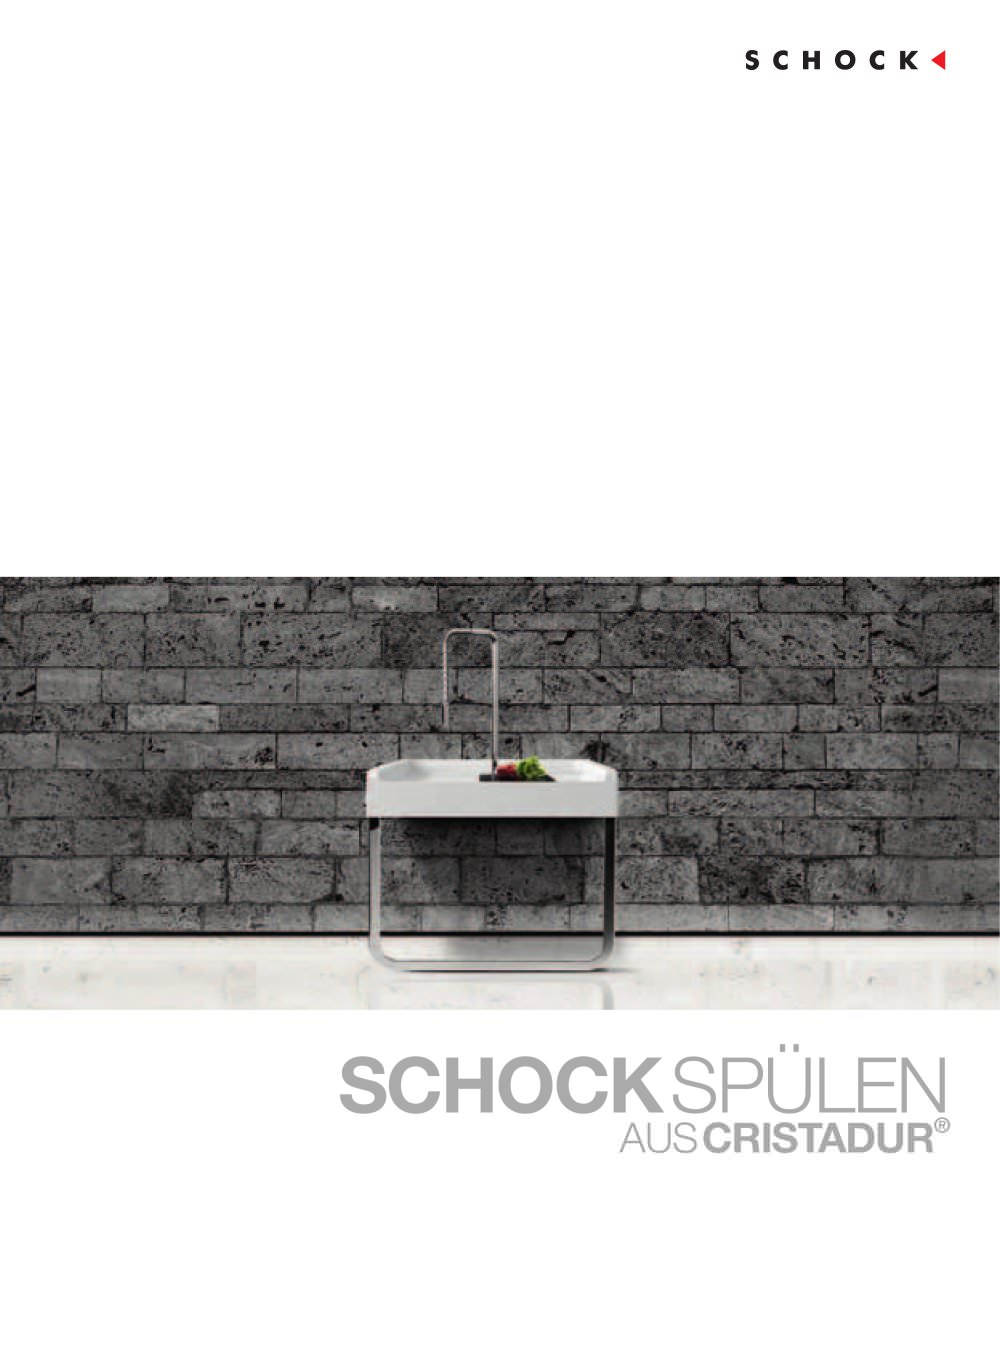 Spülbecken Küche Günstig: Küchenspüle Einbauspüle